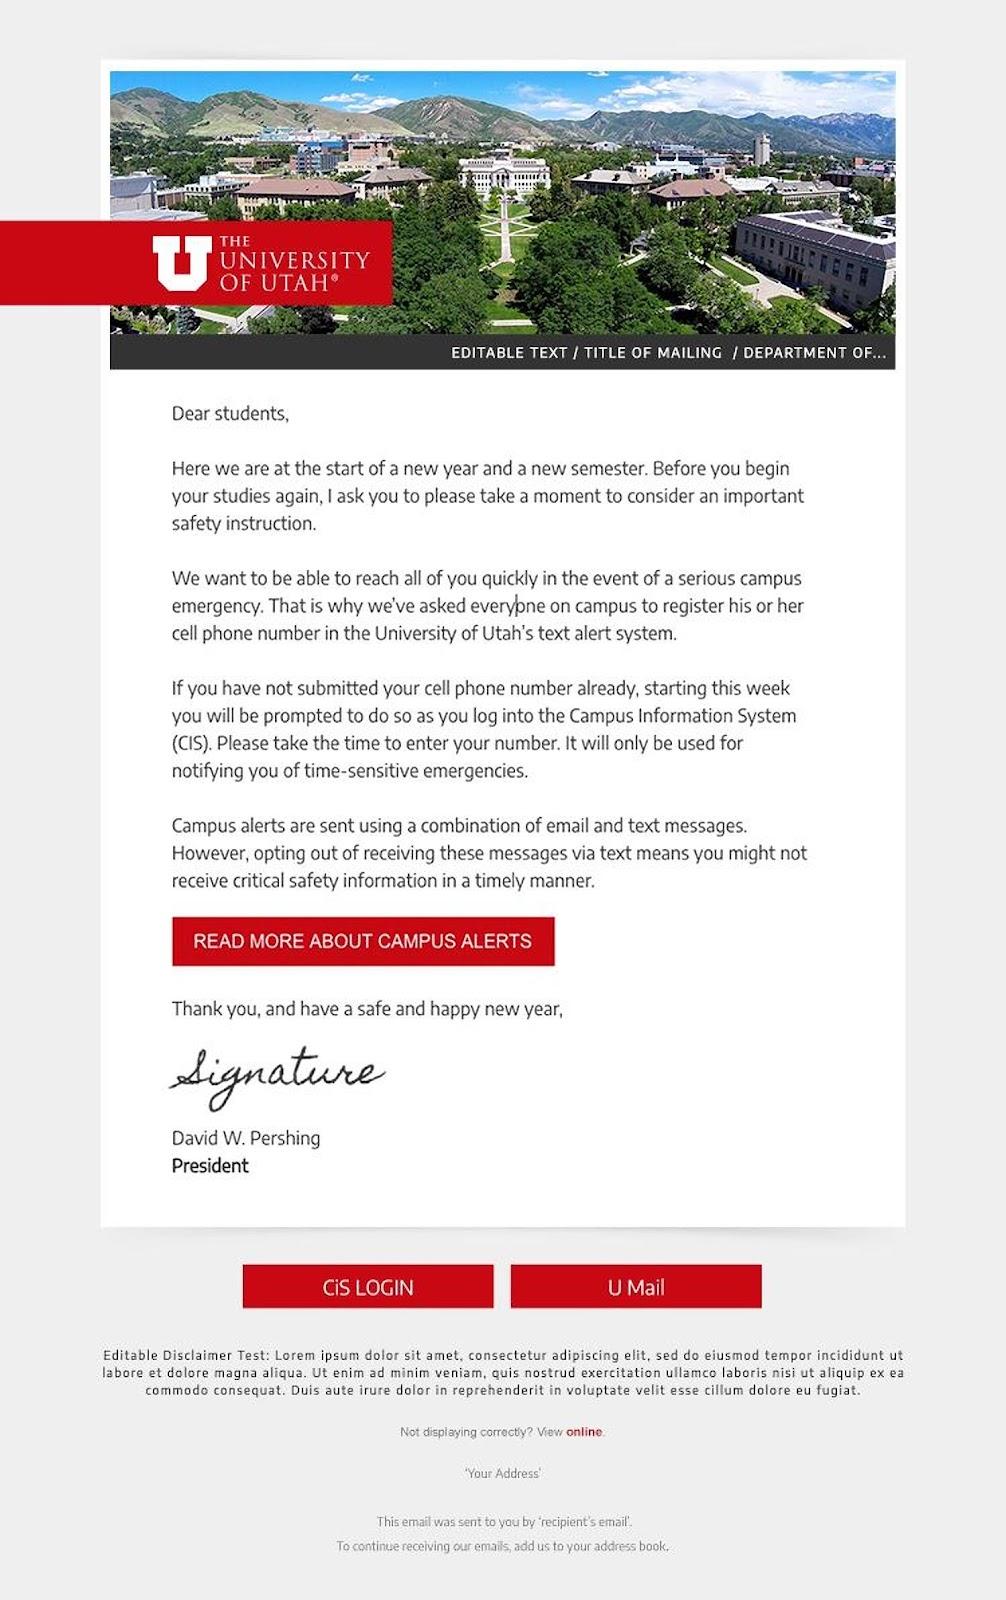 University of Utah email example